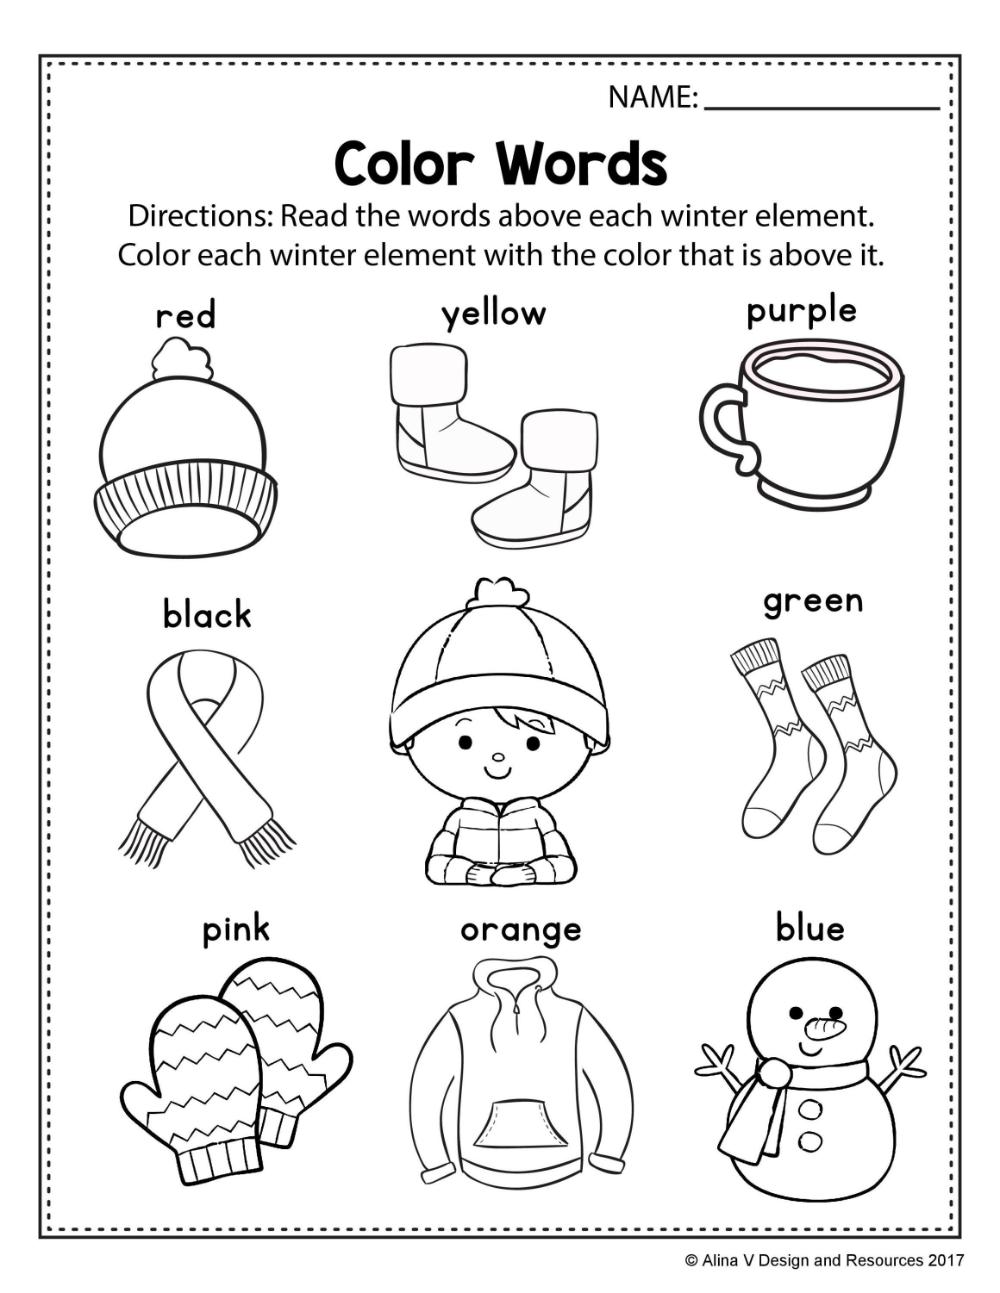 Free Winter Literacy Worksheet For Kindergarten Prep Alina Kindergarten Worksheets Kindergarten Math Worksheets Kindergarten Worksheets Printable [ 1293 x 1000 Pixel ]